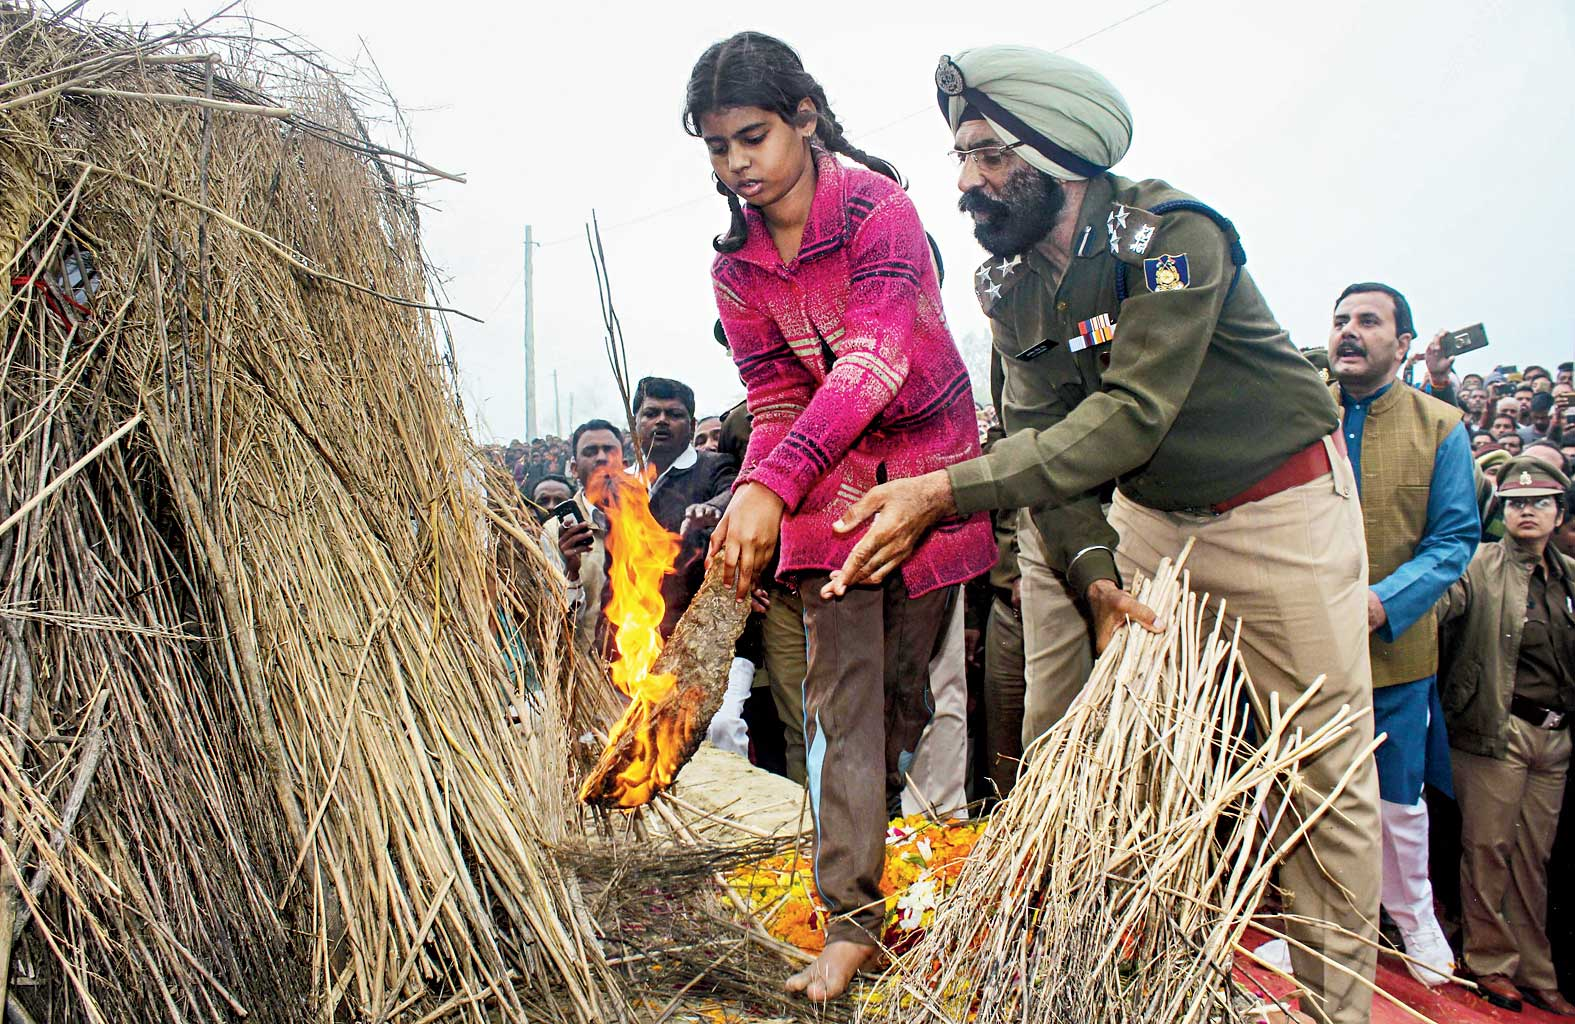 Supriya, 12, lights the funeral pyre of her father Pradeep Singh Yadav in Kannauj, Uttar Pradesh. She fainted while she was lighting it.